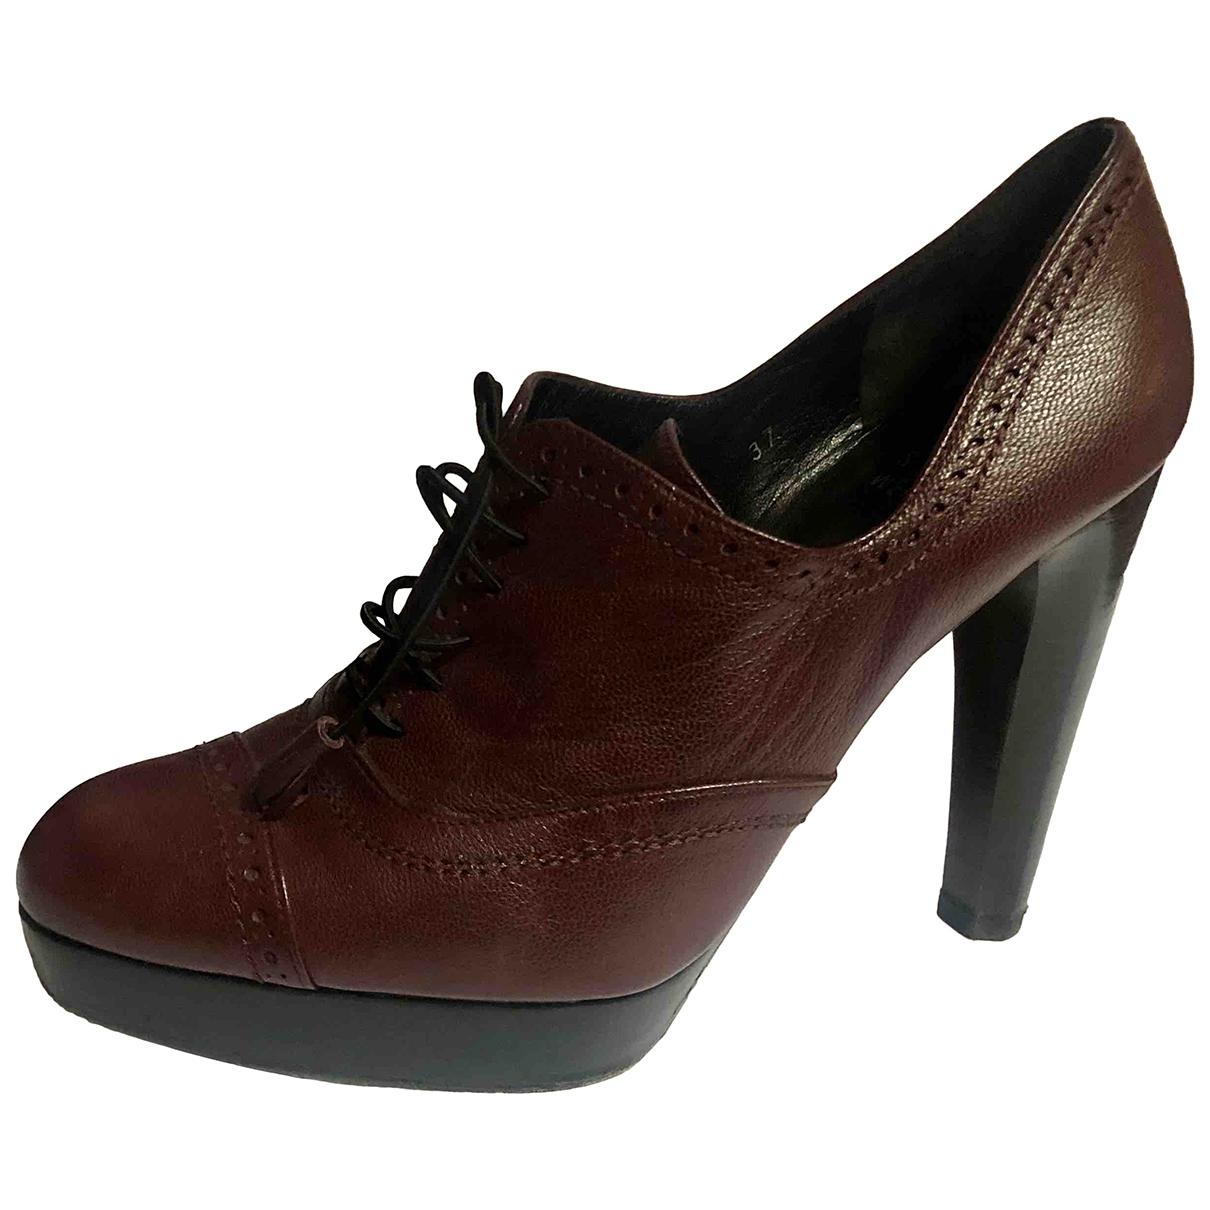 Stuart Weitzman \N Burgundy Leather Ankle boots for Women 37 EU